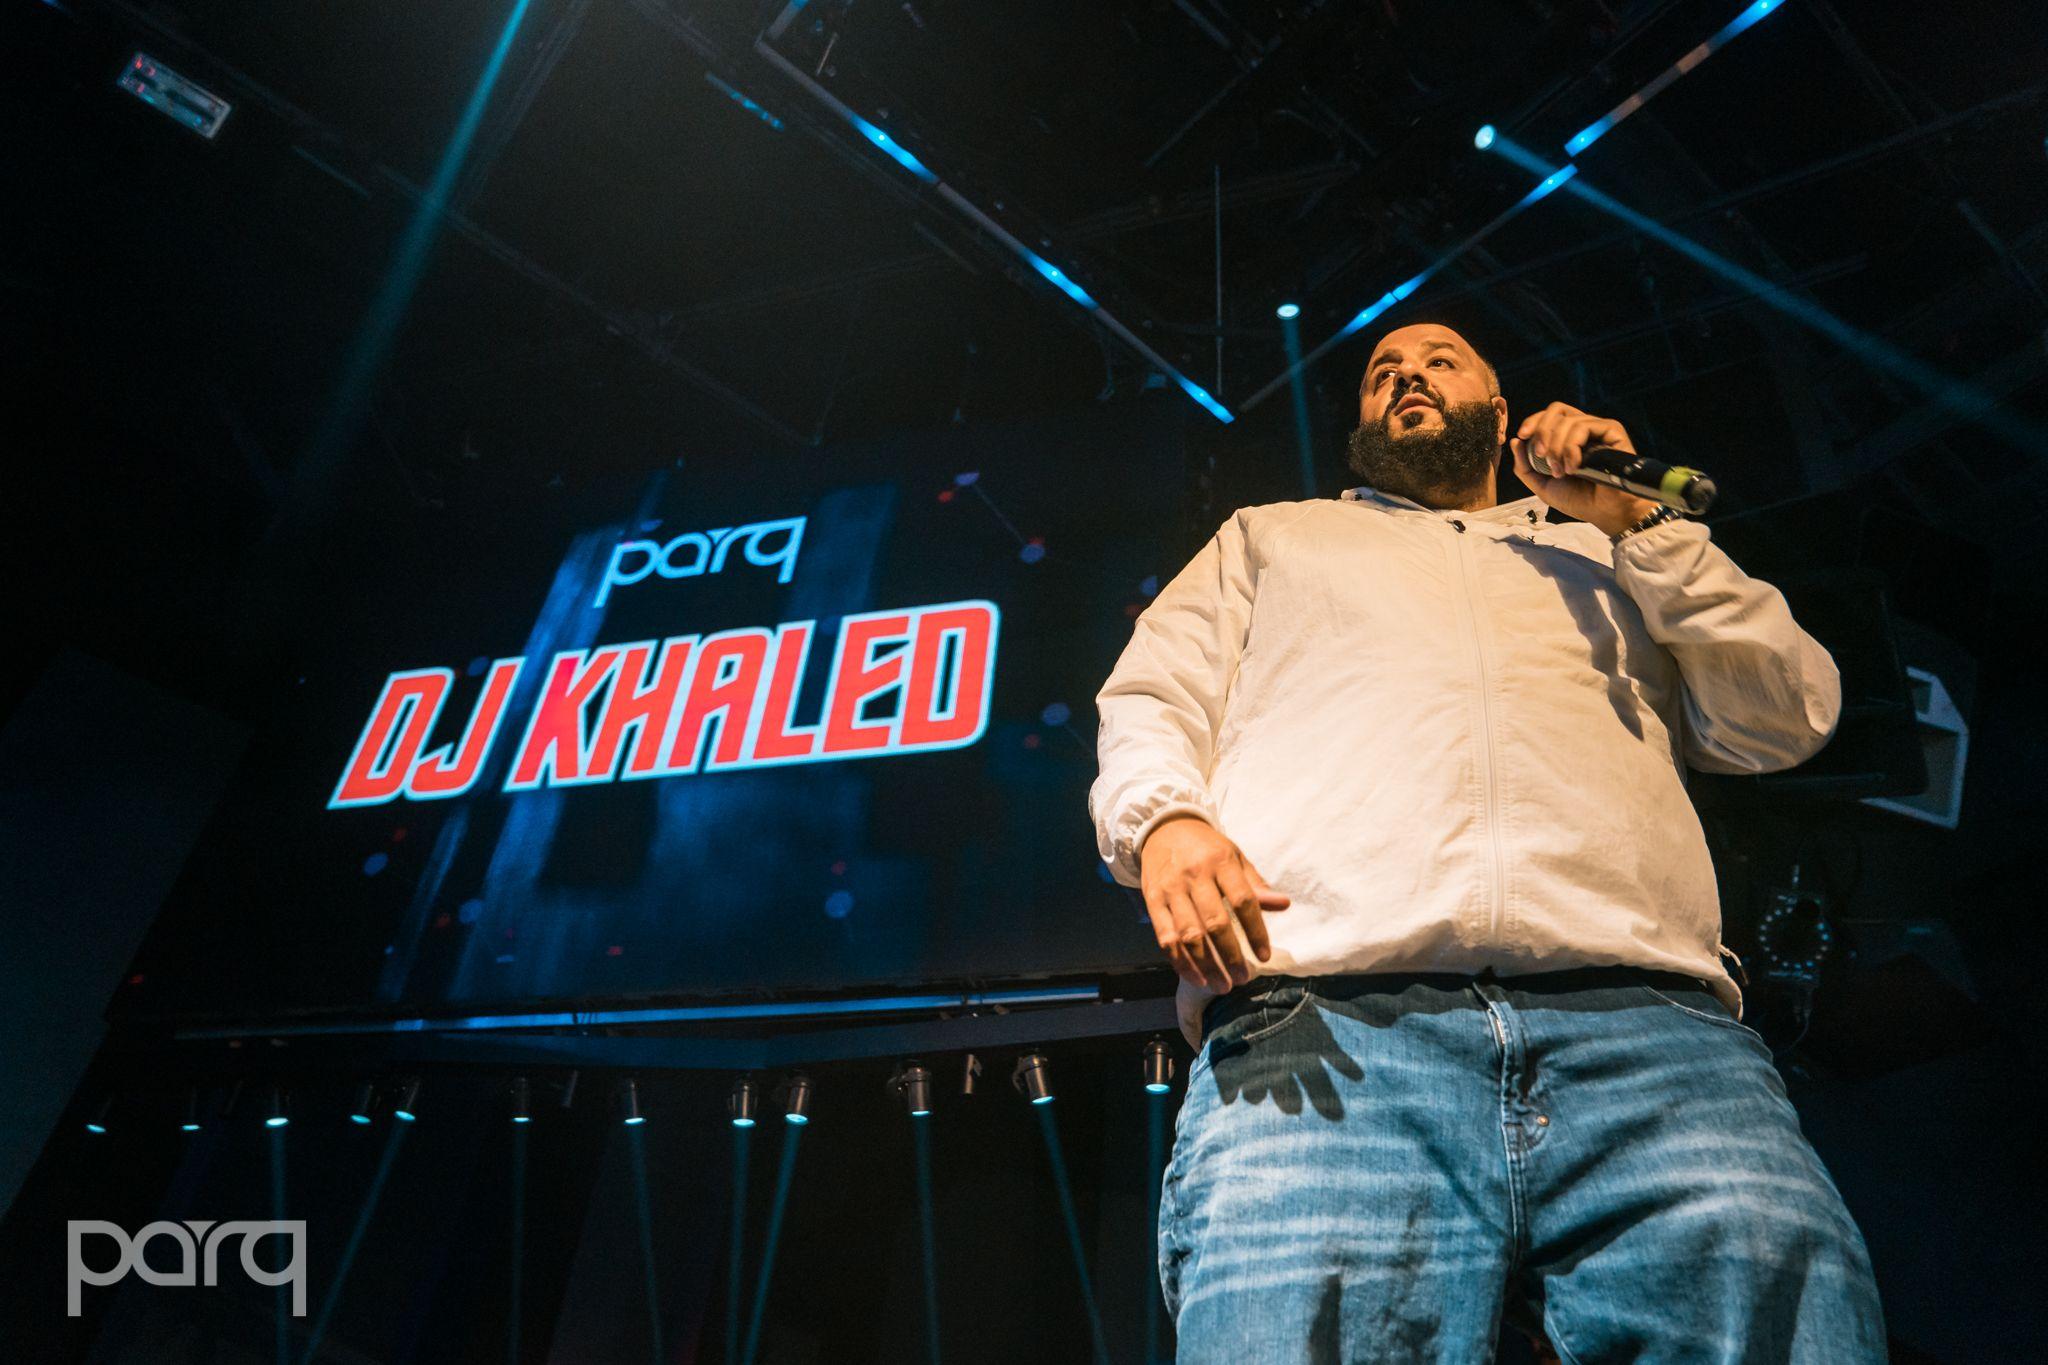 09.27.18 Parq - DJ Khaled-28.jpg